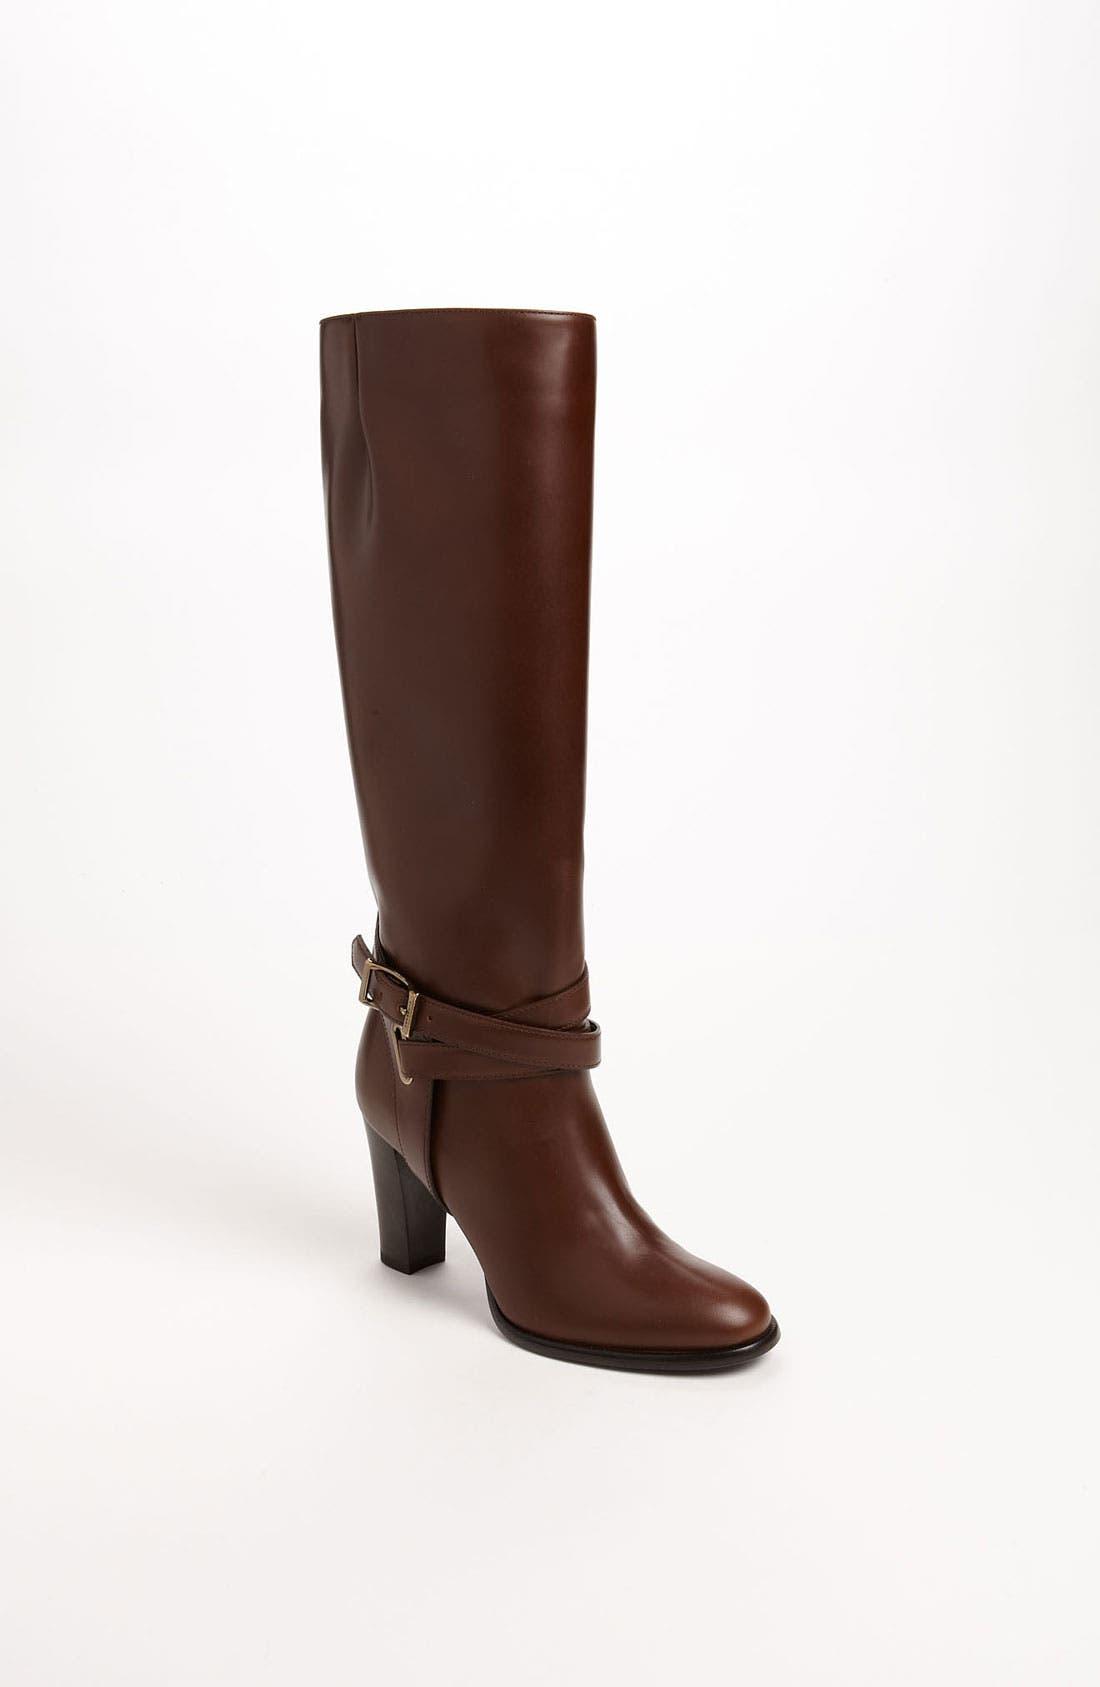 Main Image - Burberry 'Adeline' High Heel Boot